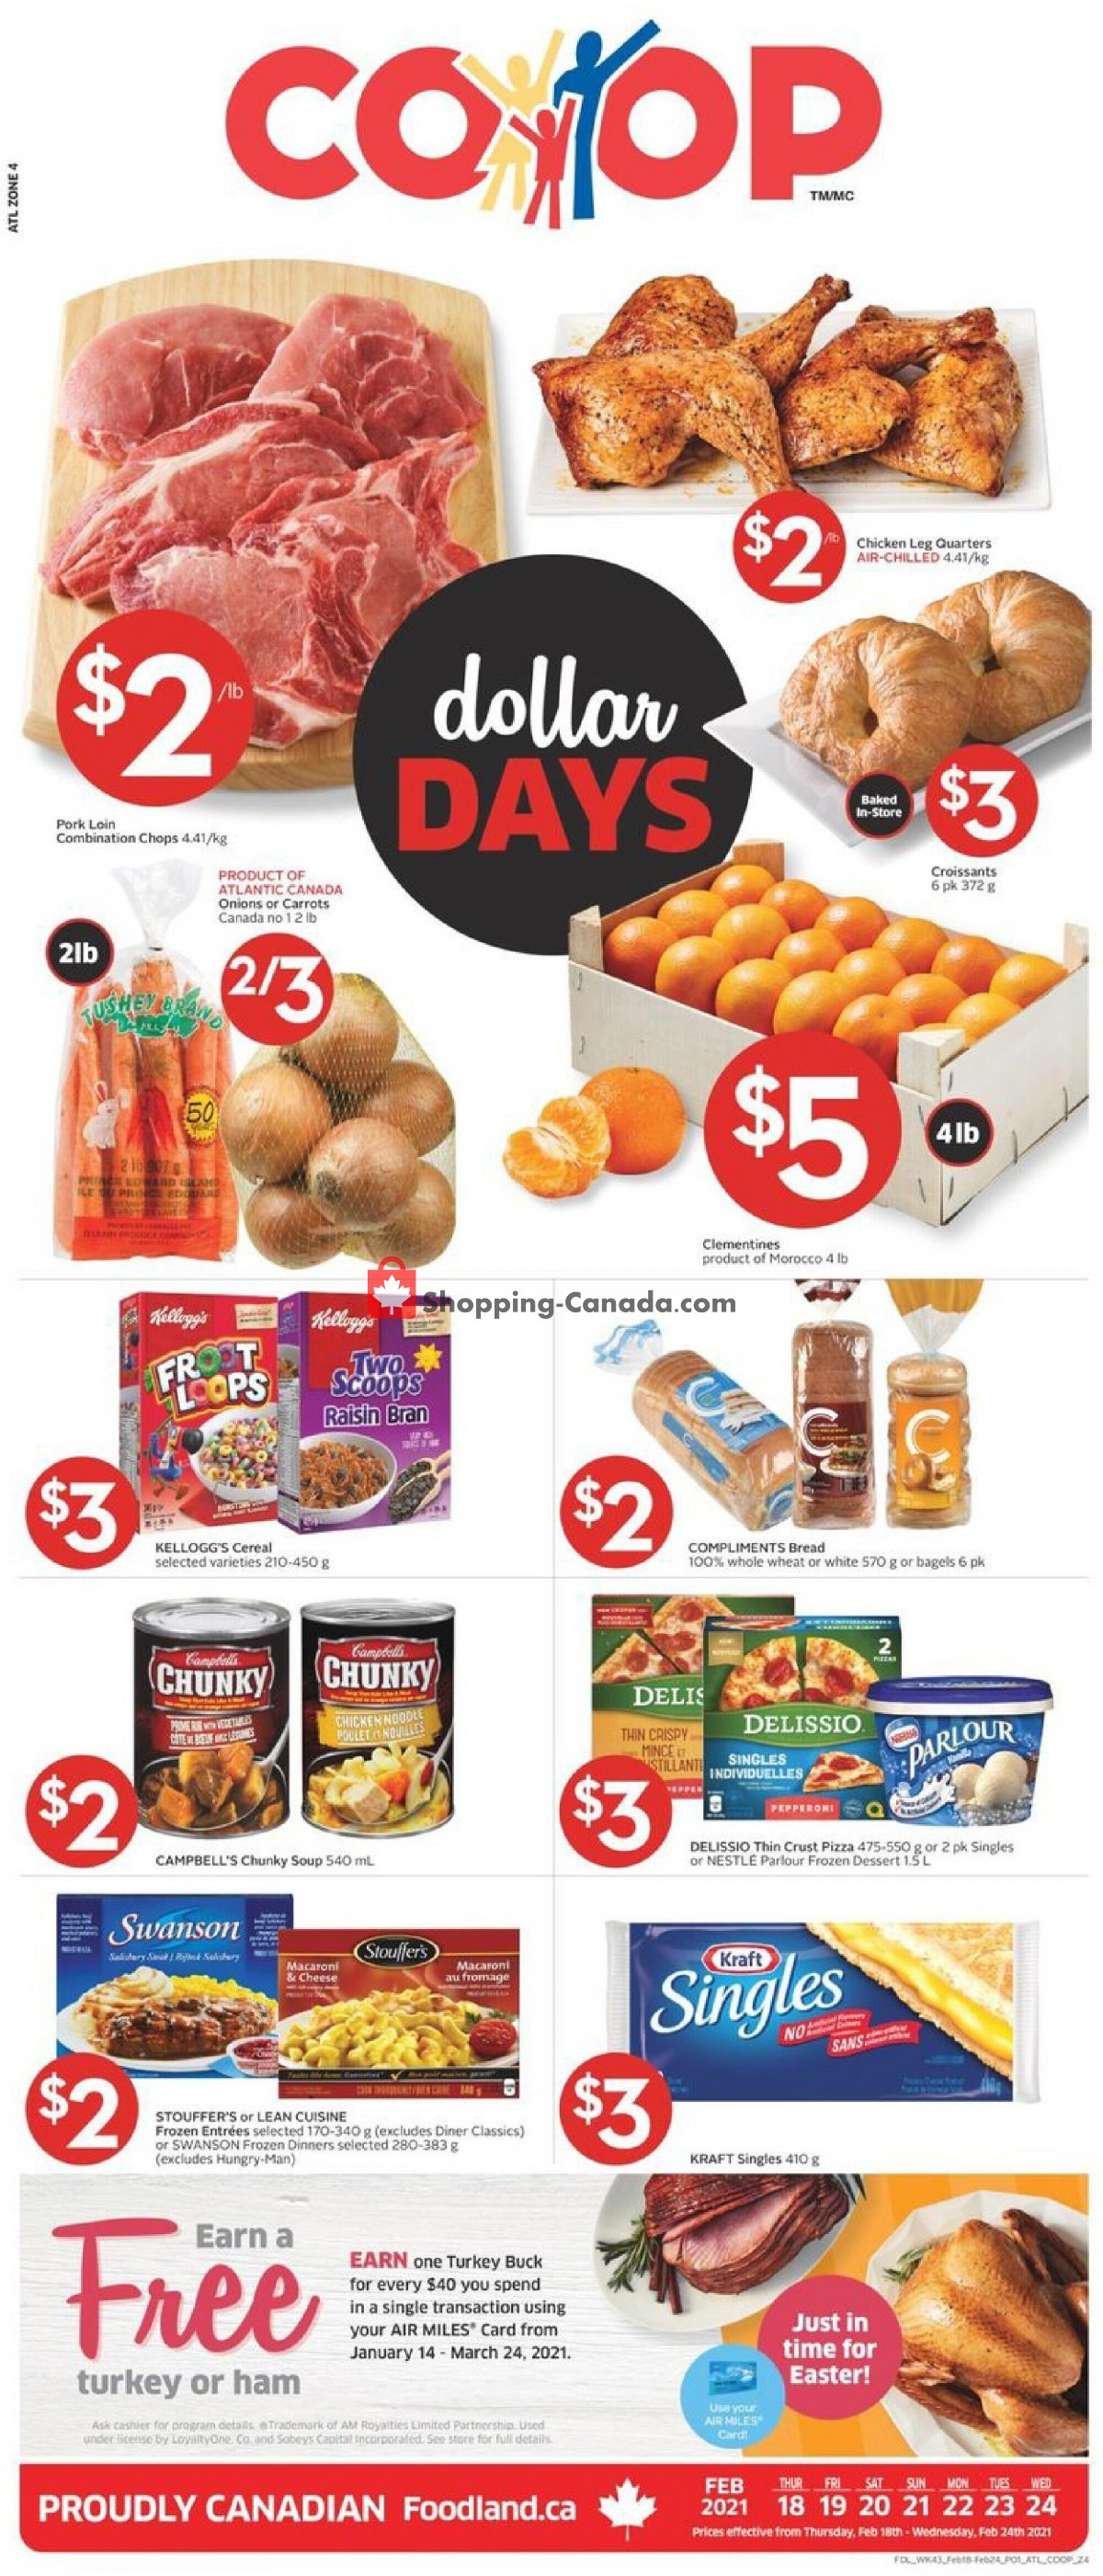 Flyer Foodland Canada - from Thursday February 18, 2021 to Wednesday February 24, 2021